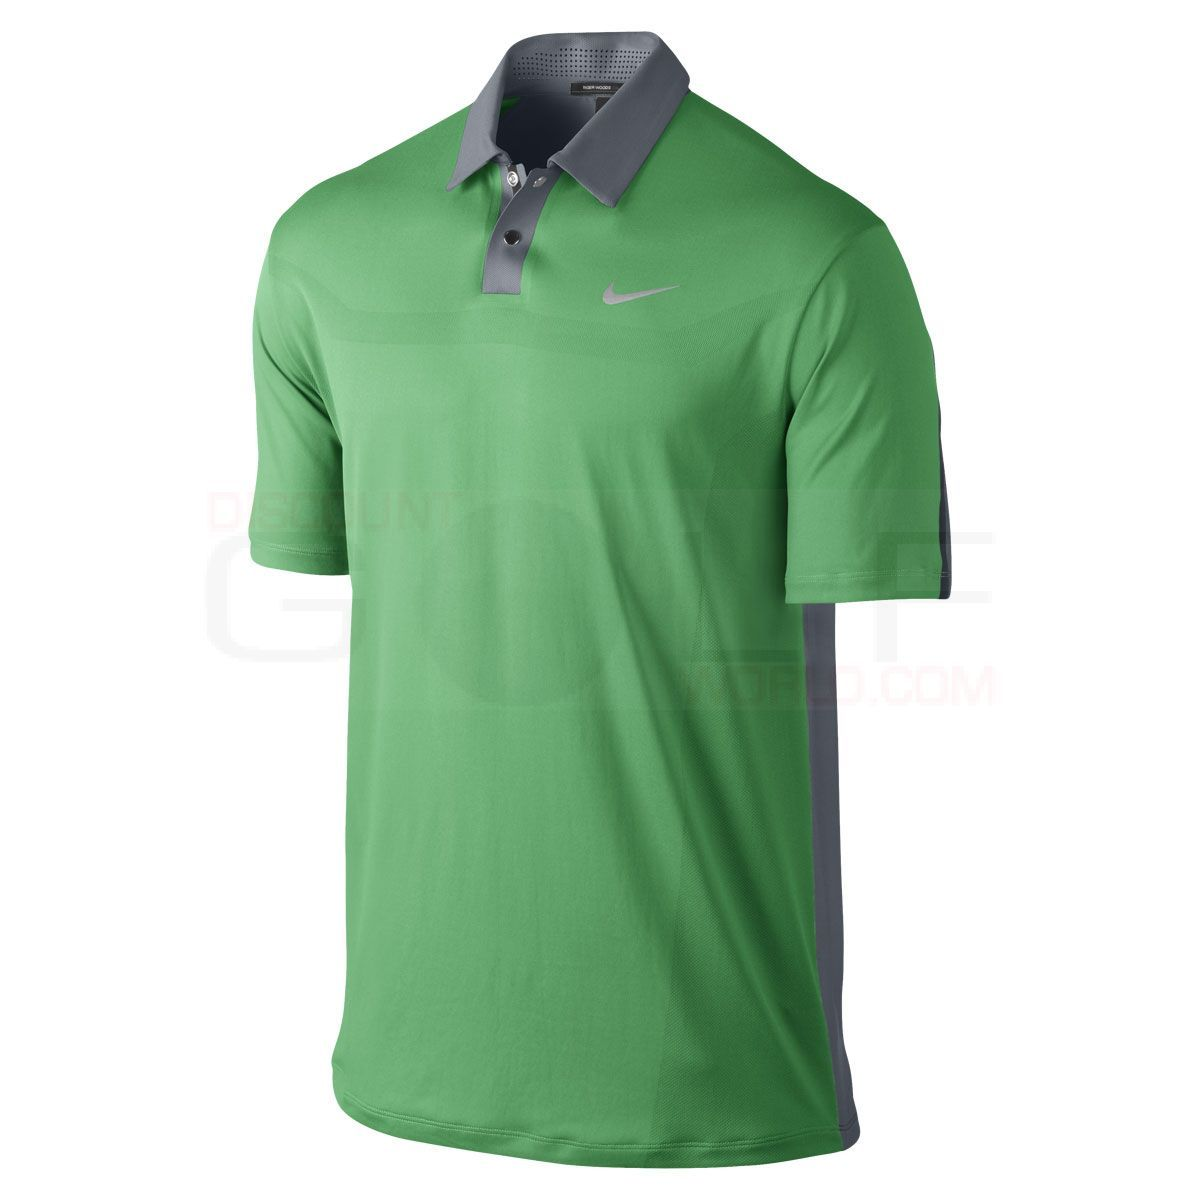 nike discount golf apparel